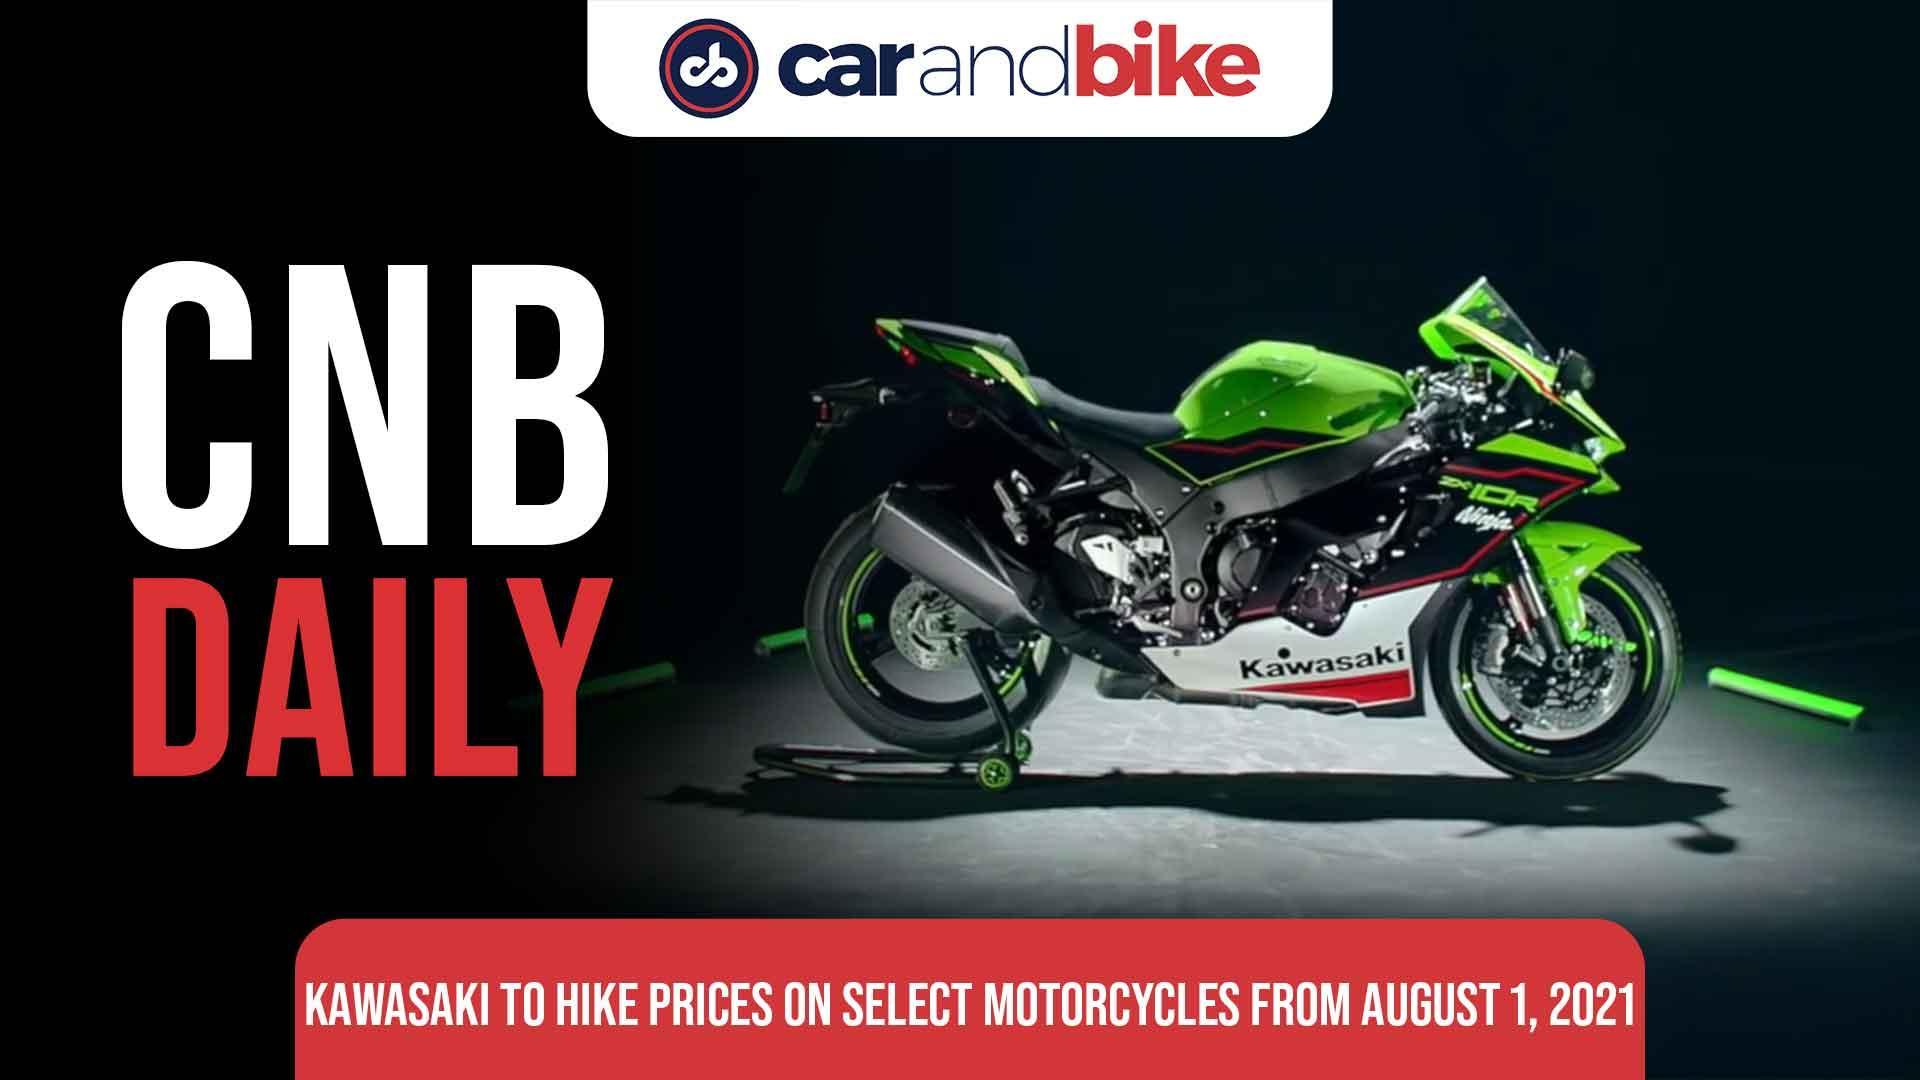 Kawasaki India To Hike Prices On Select Motorcycles